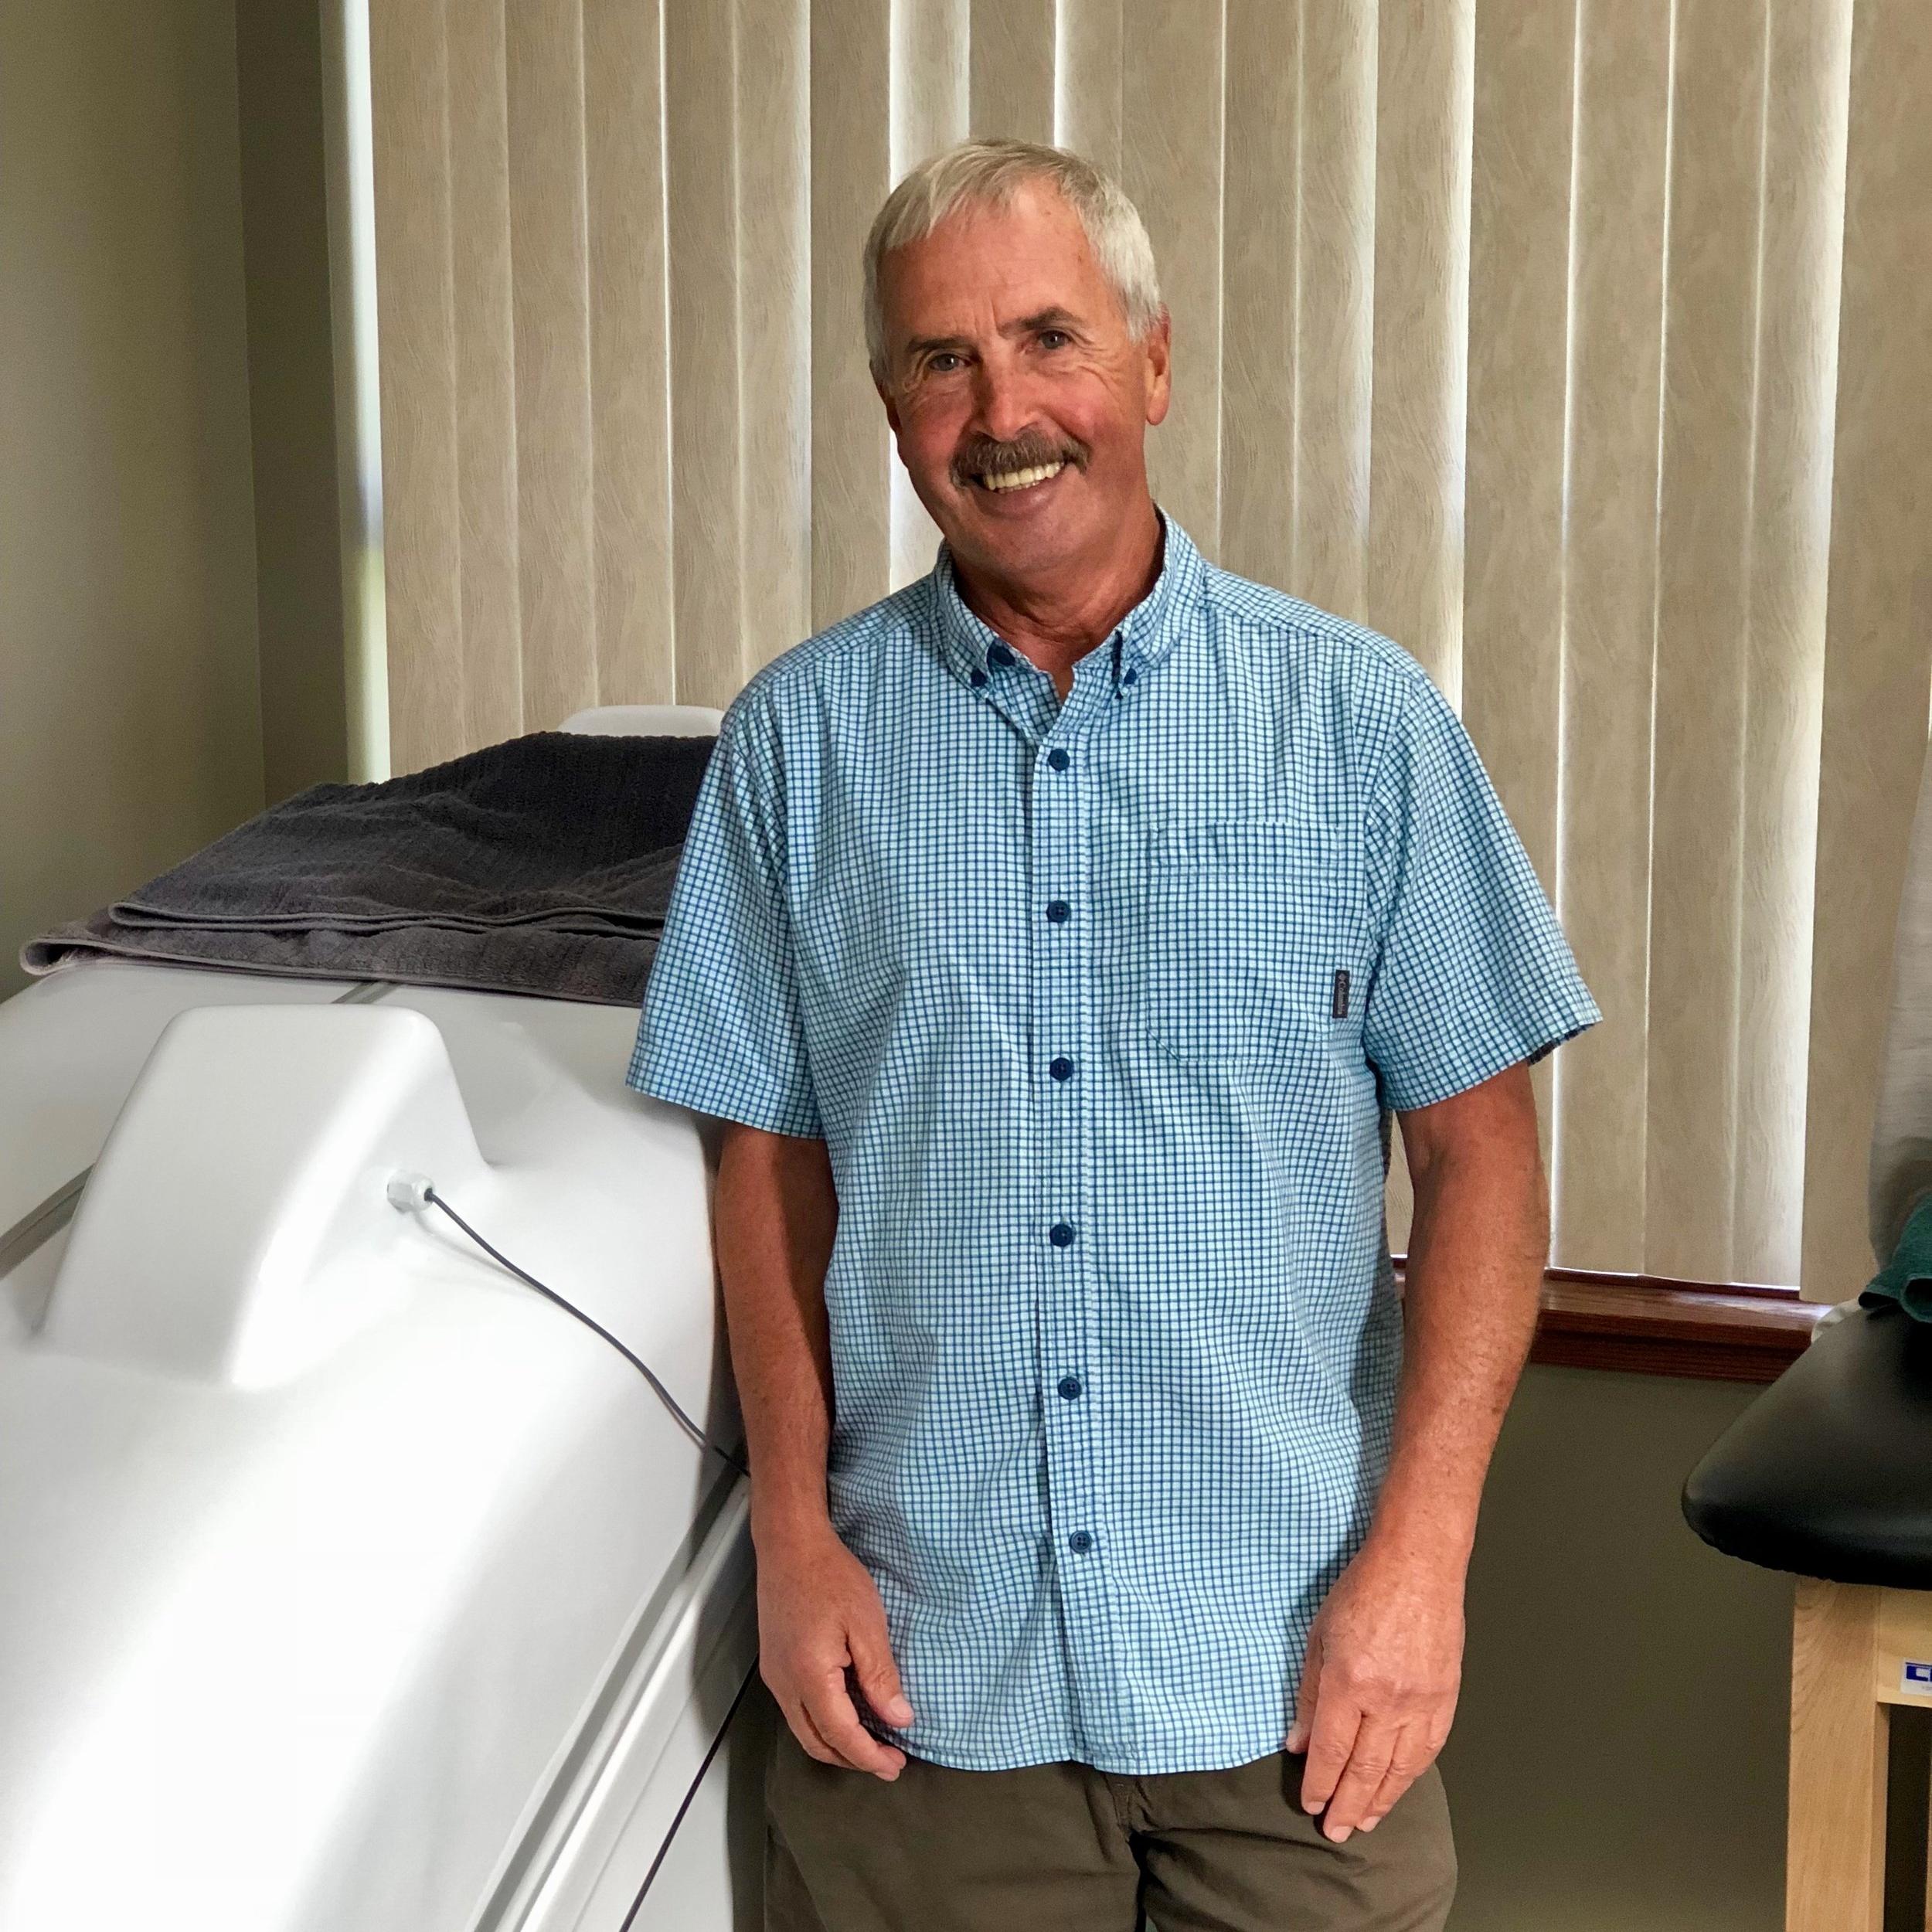 Doug Herbruck, Senior HOCATT Technician - For set up or mechanical questions, contact Doug at Dougendlesshealthllc@gmail.com